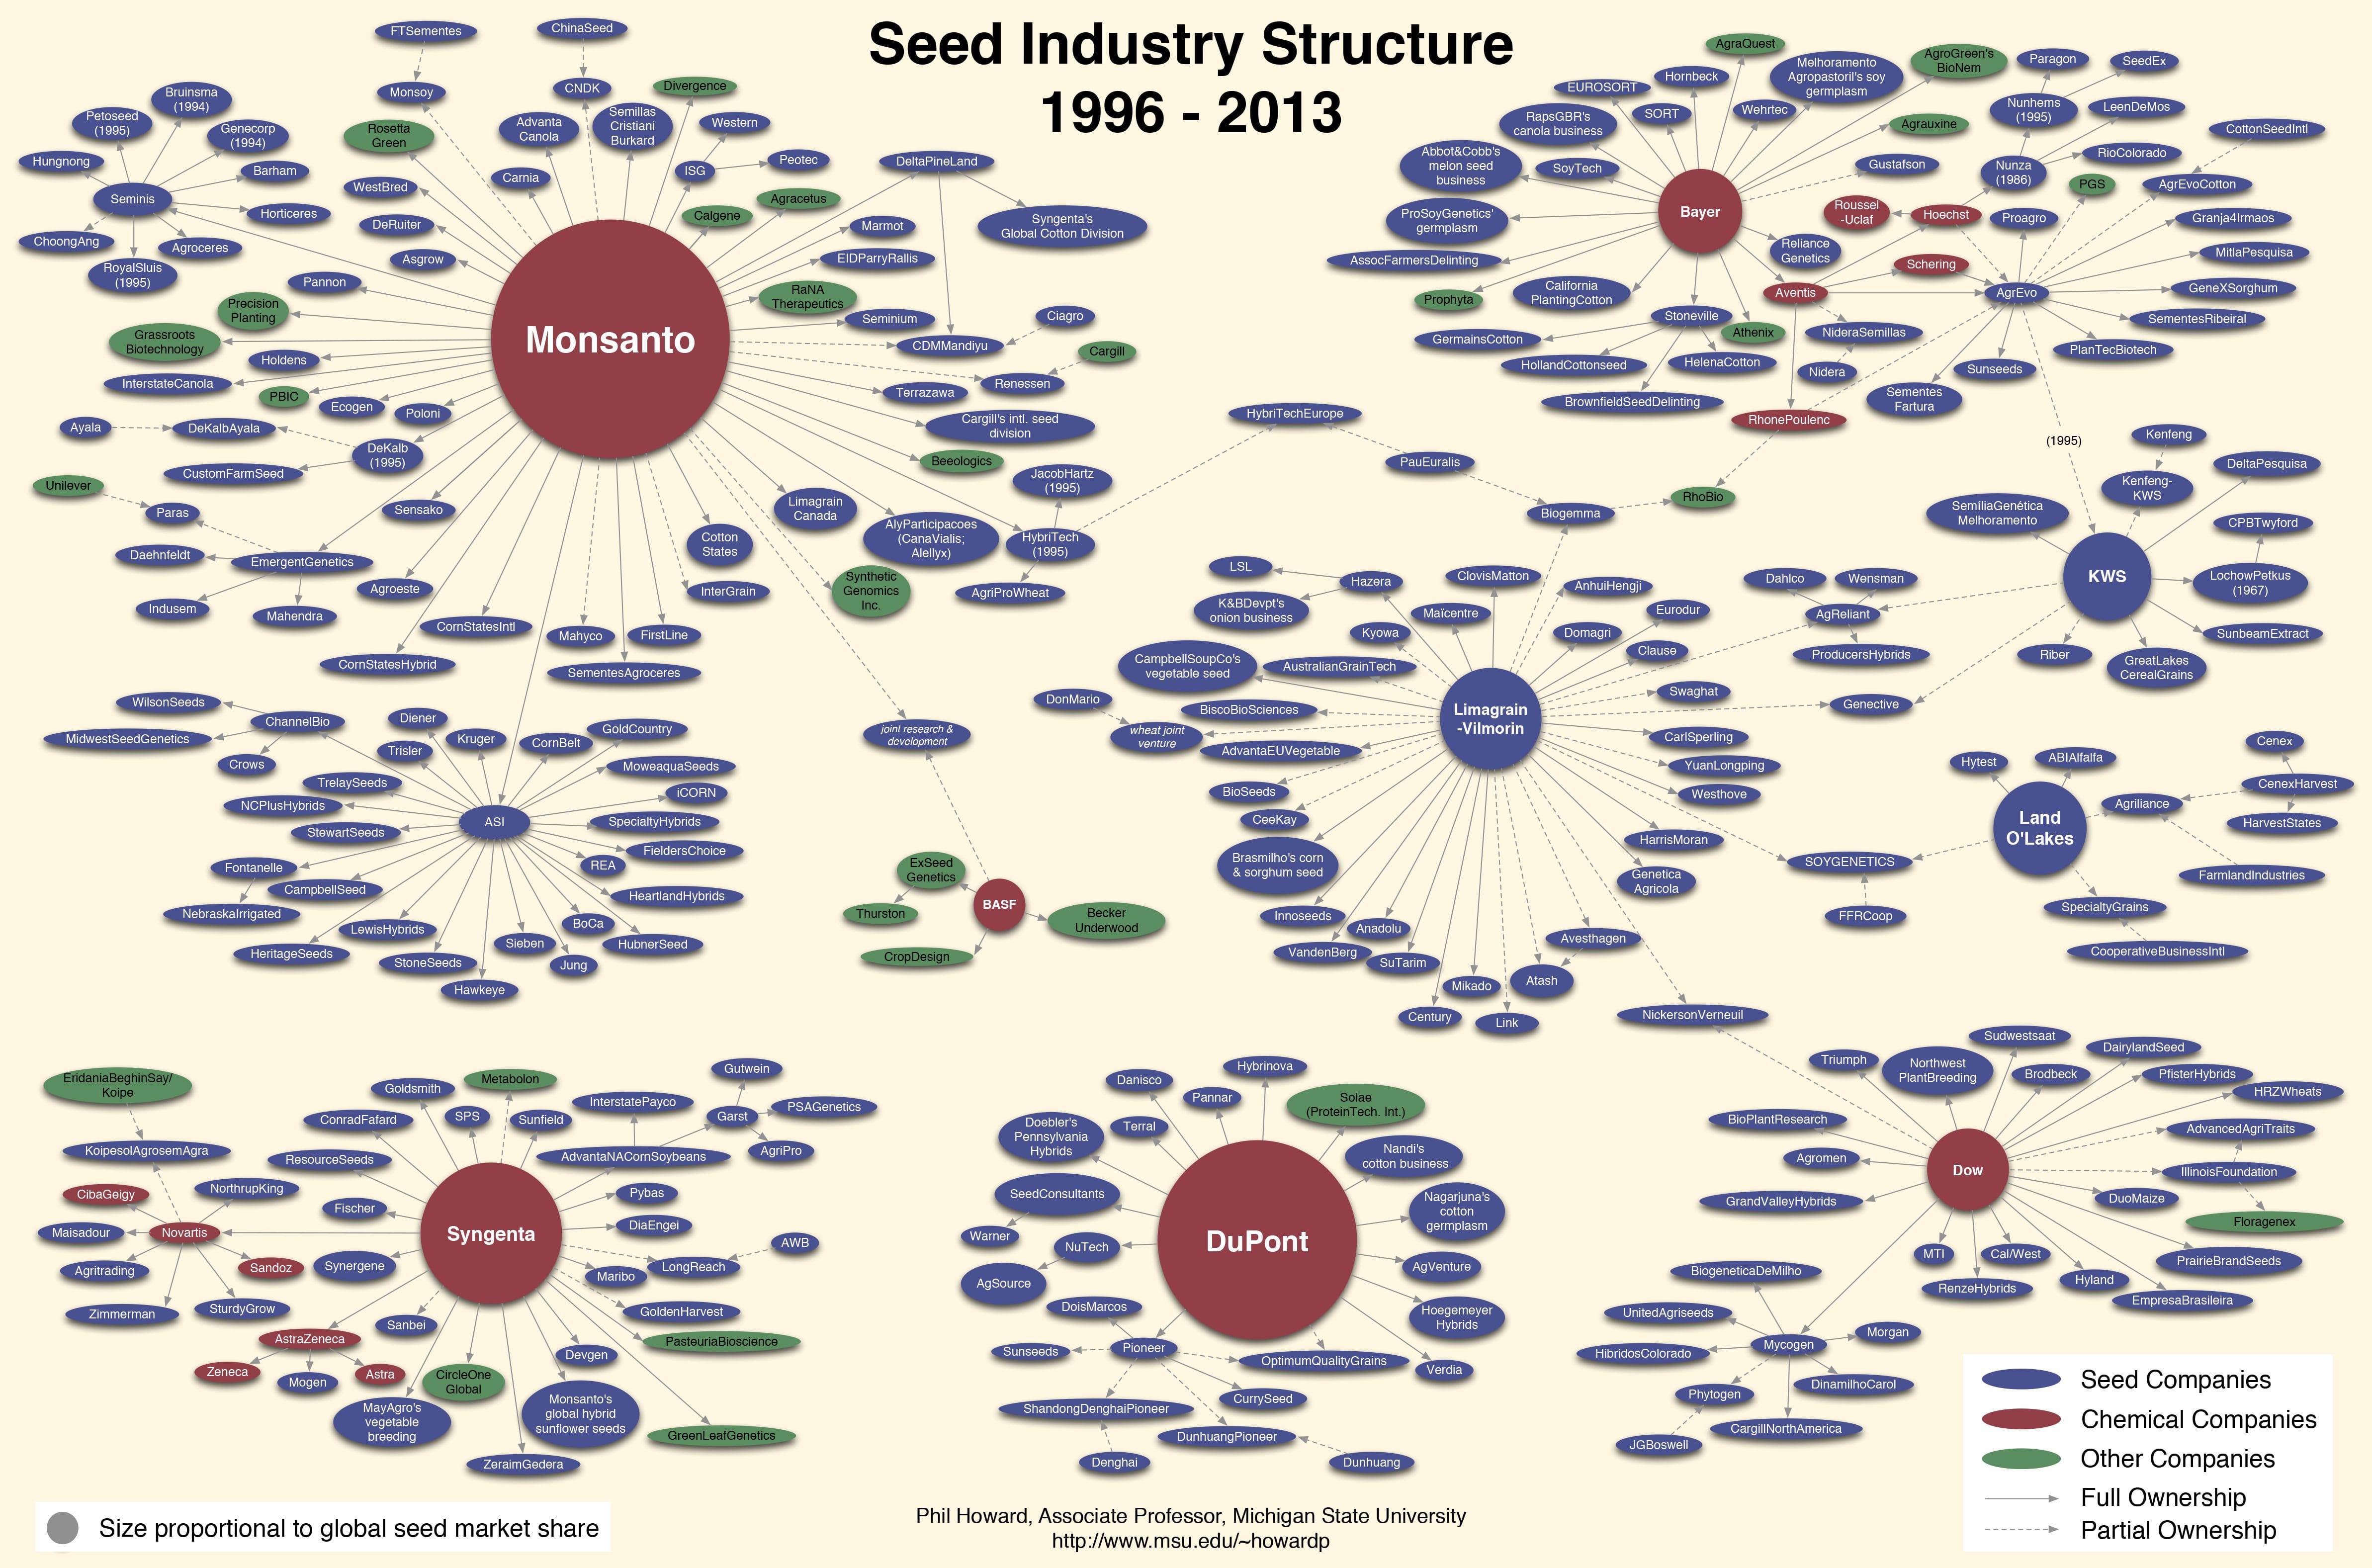 https://www.cornucopia.org/wp-content/uploads/2013/09/seedindustry.jpg